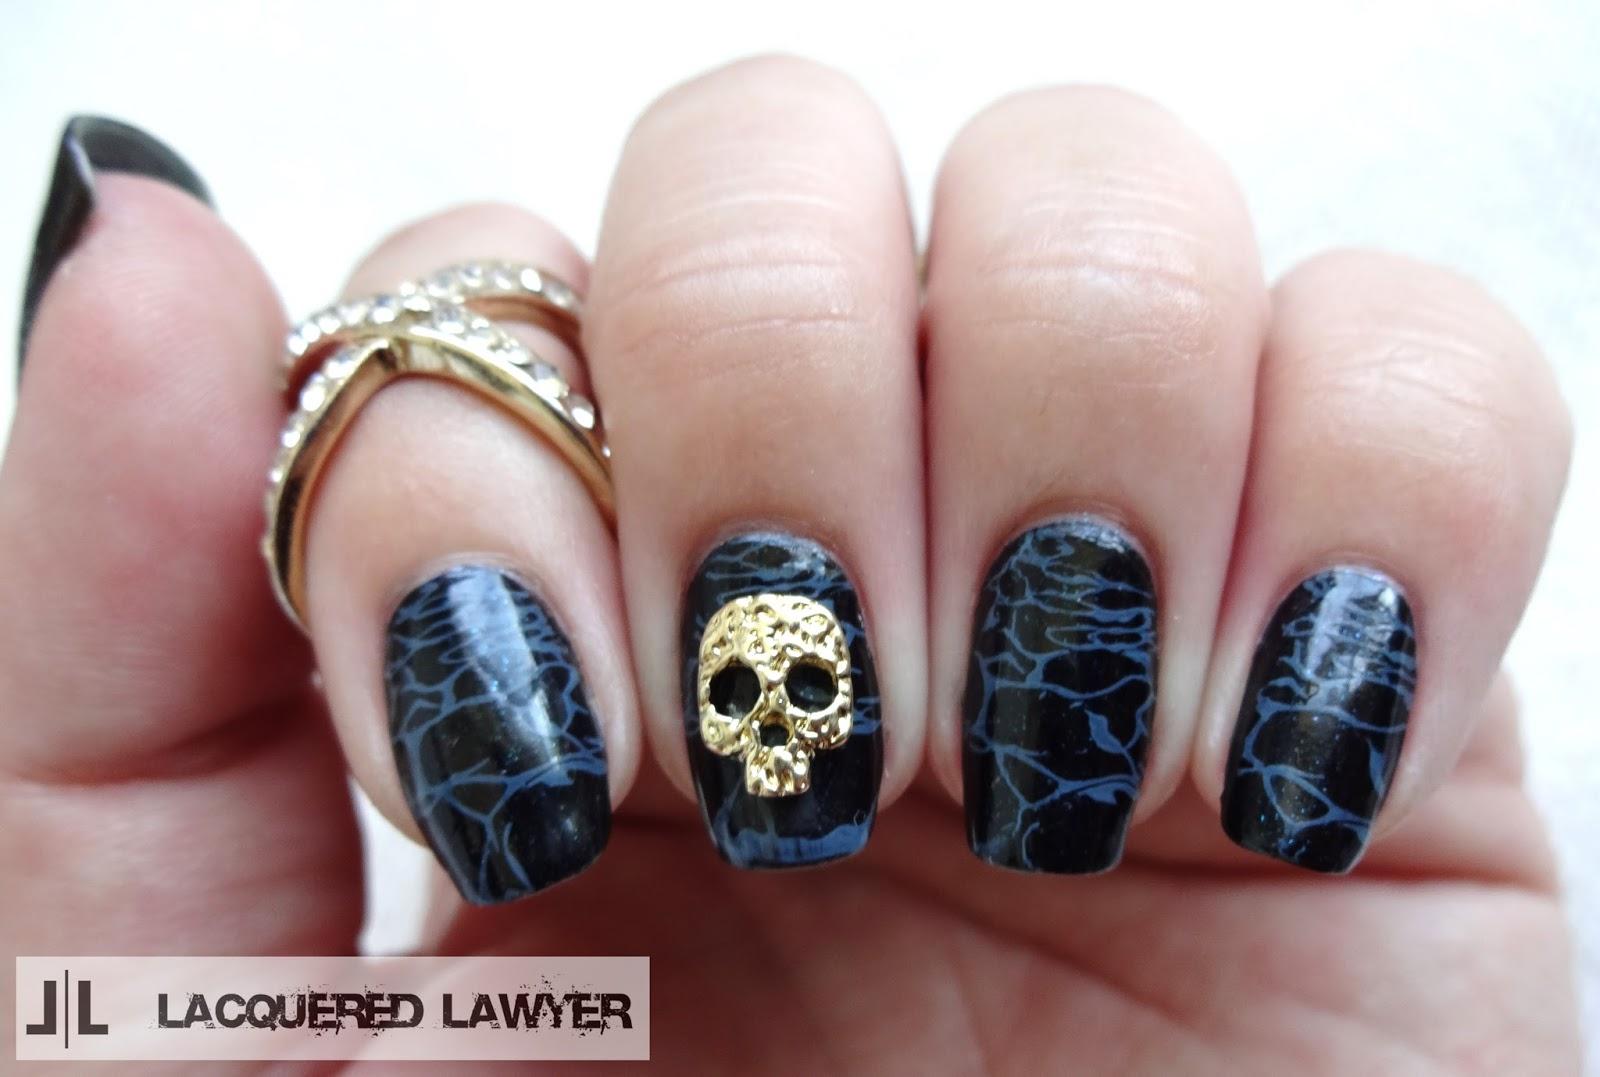 Black sea nail art with gold skull charm